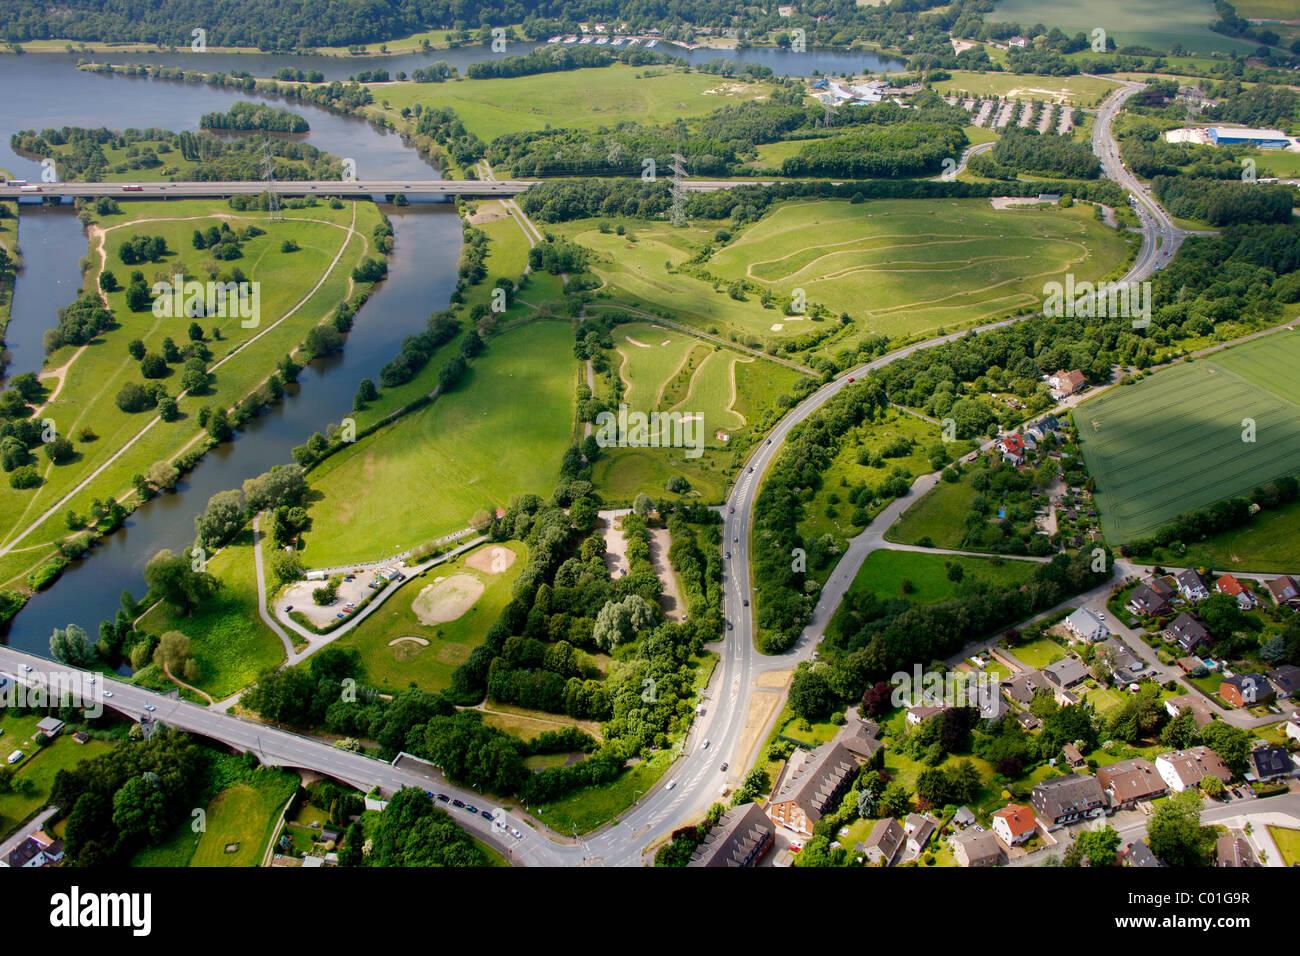 Aerial view, golf course, Deponie Heven landfill, Seestrasse street, Witten, Ruhrgebiet area, North Rhine-Westphalia - Stock Image